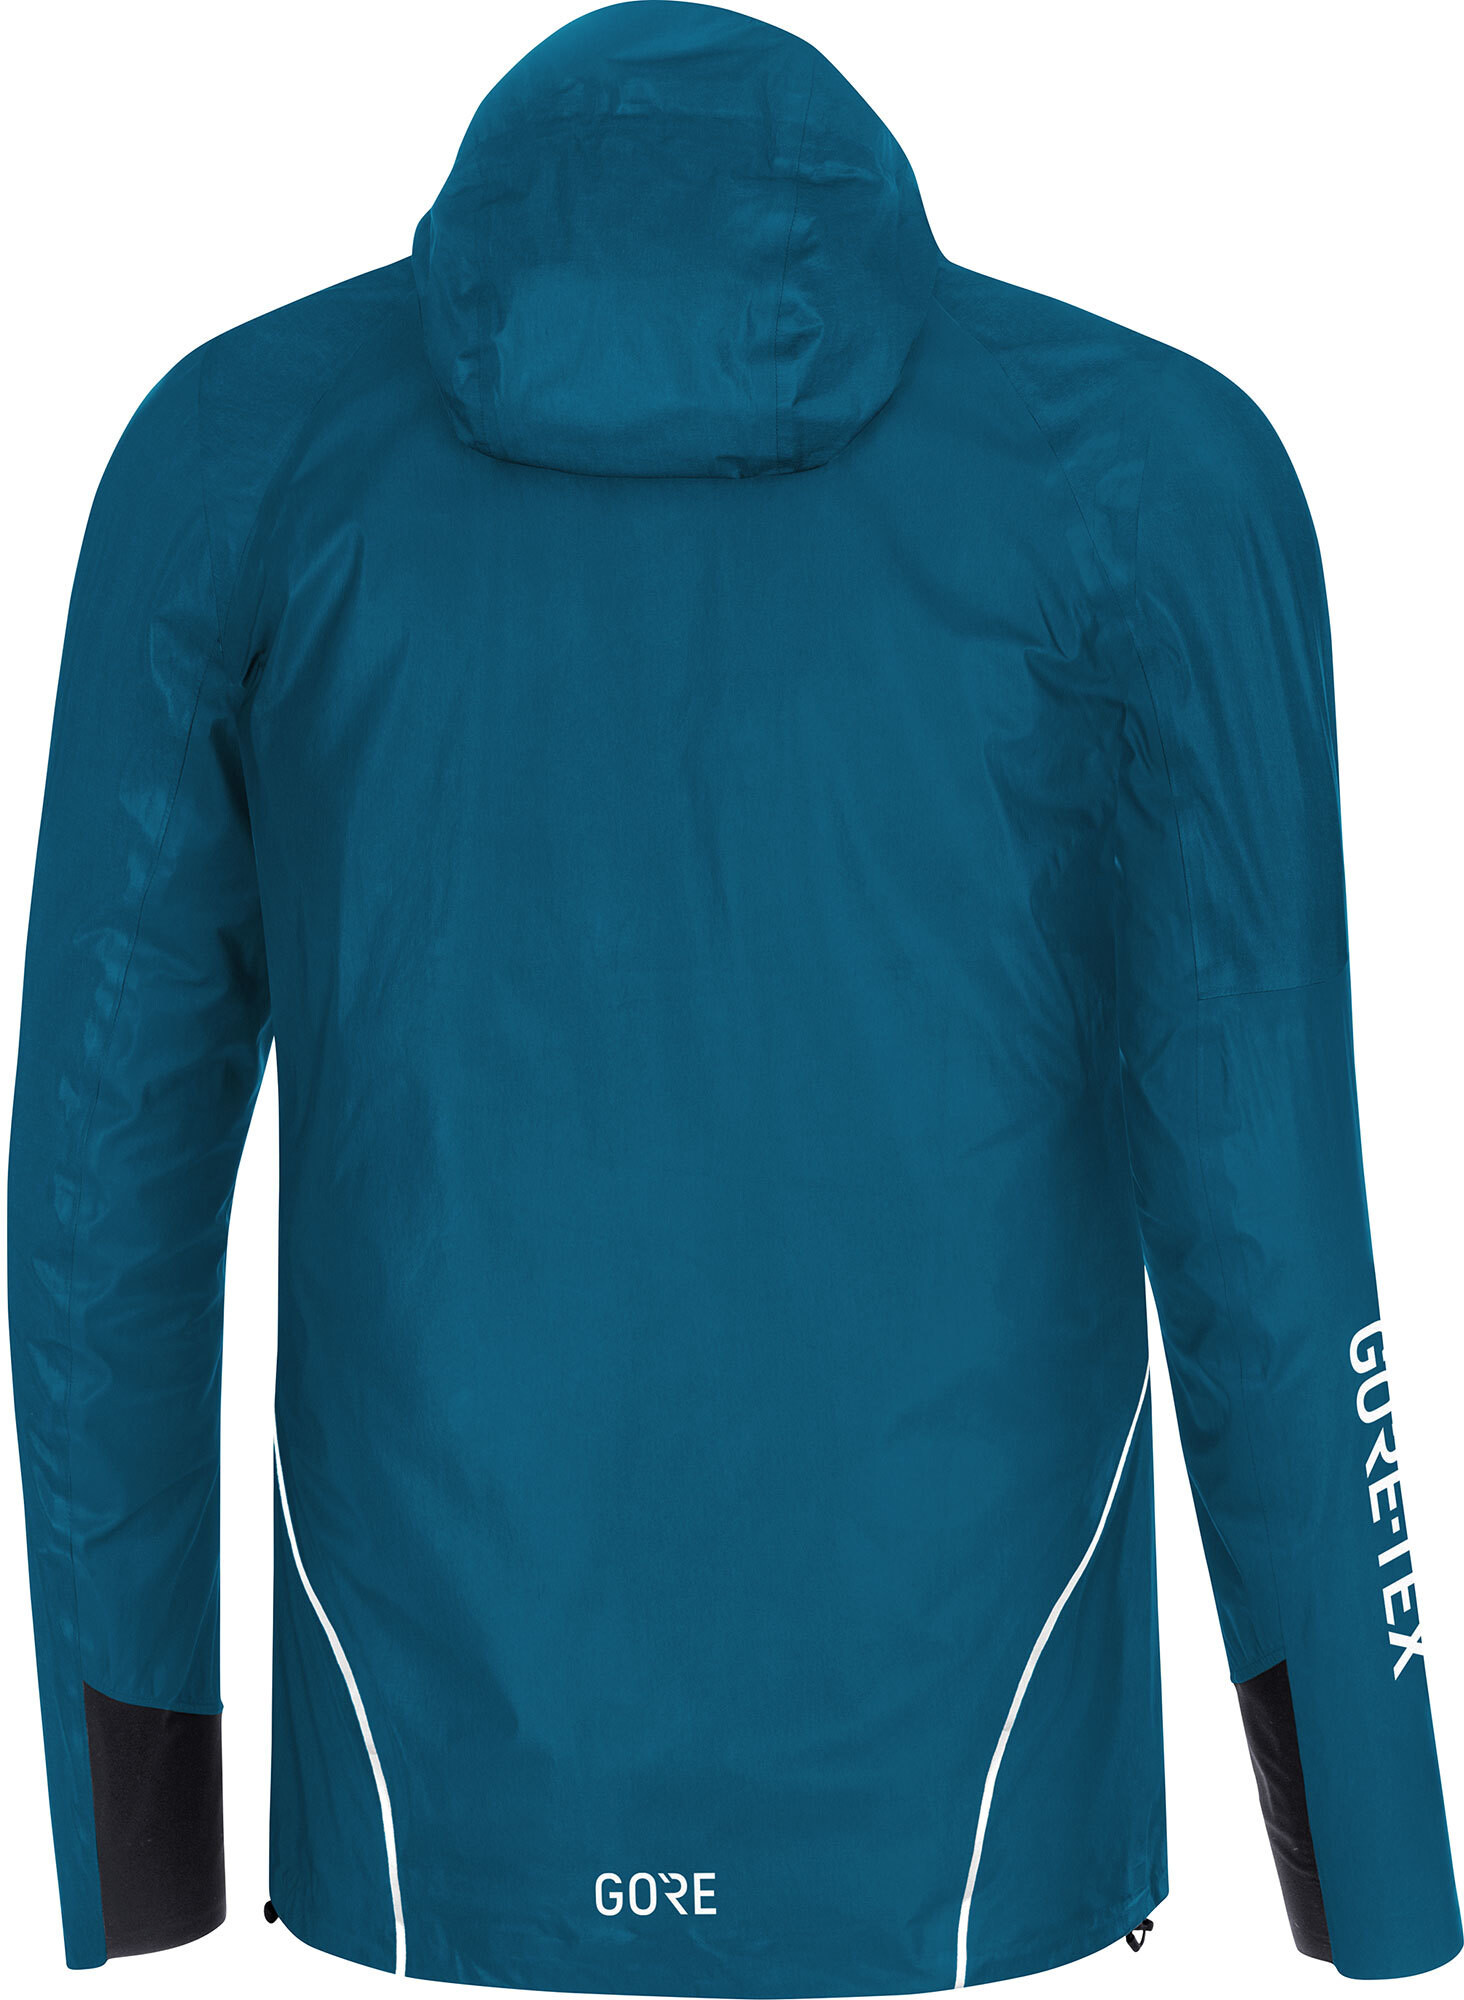 Originally £100 Gore Wear Mens Windstopper Running Vest in various sizes